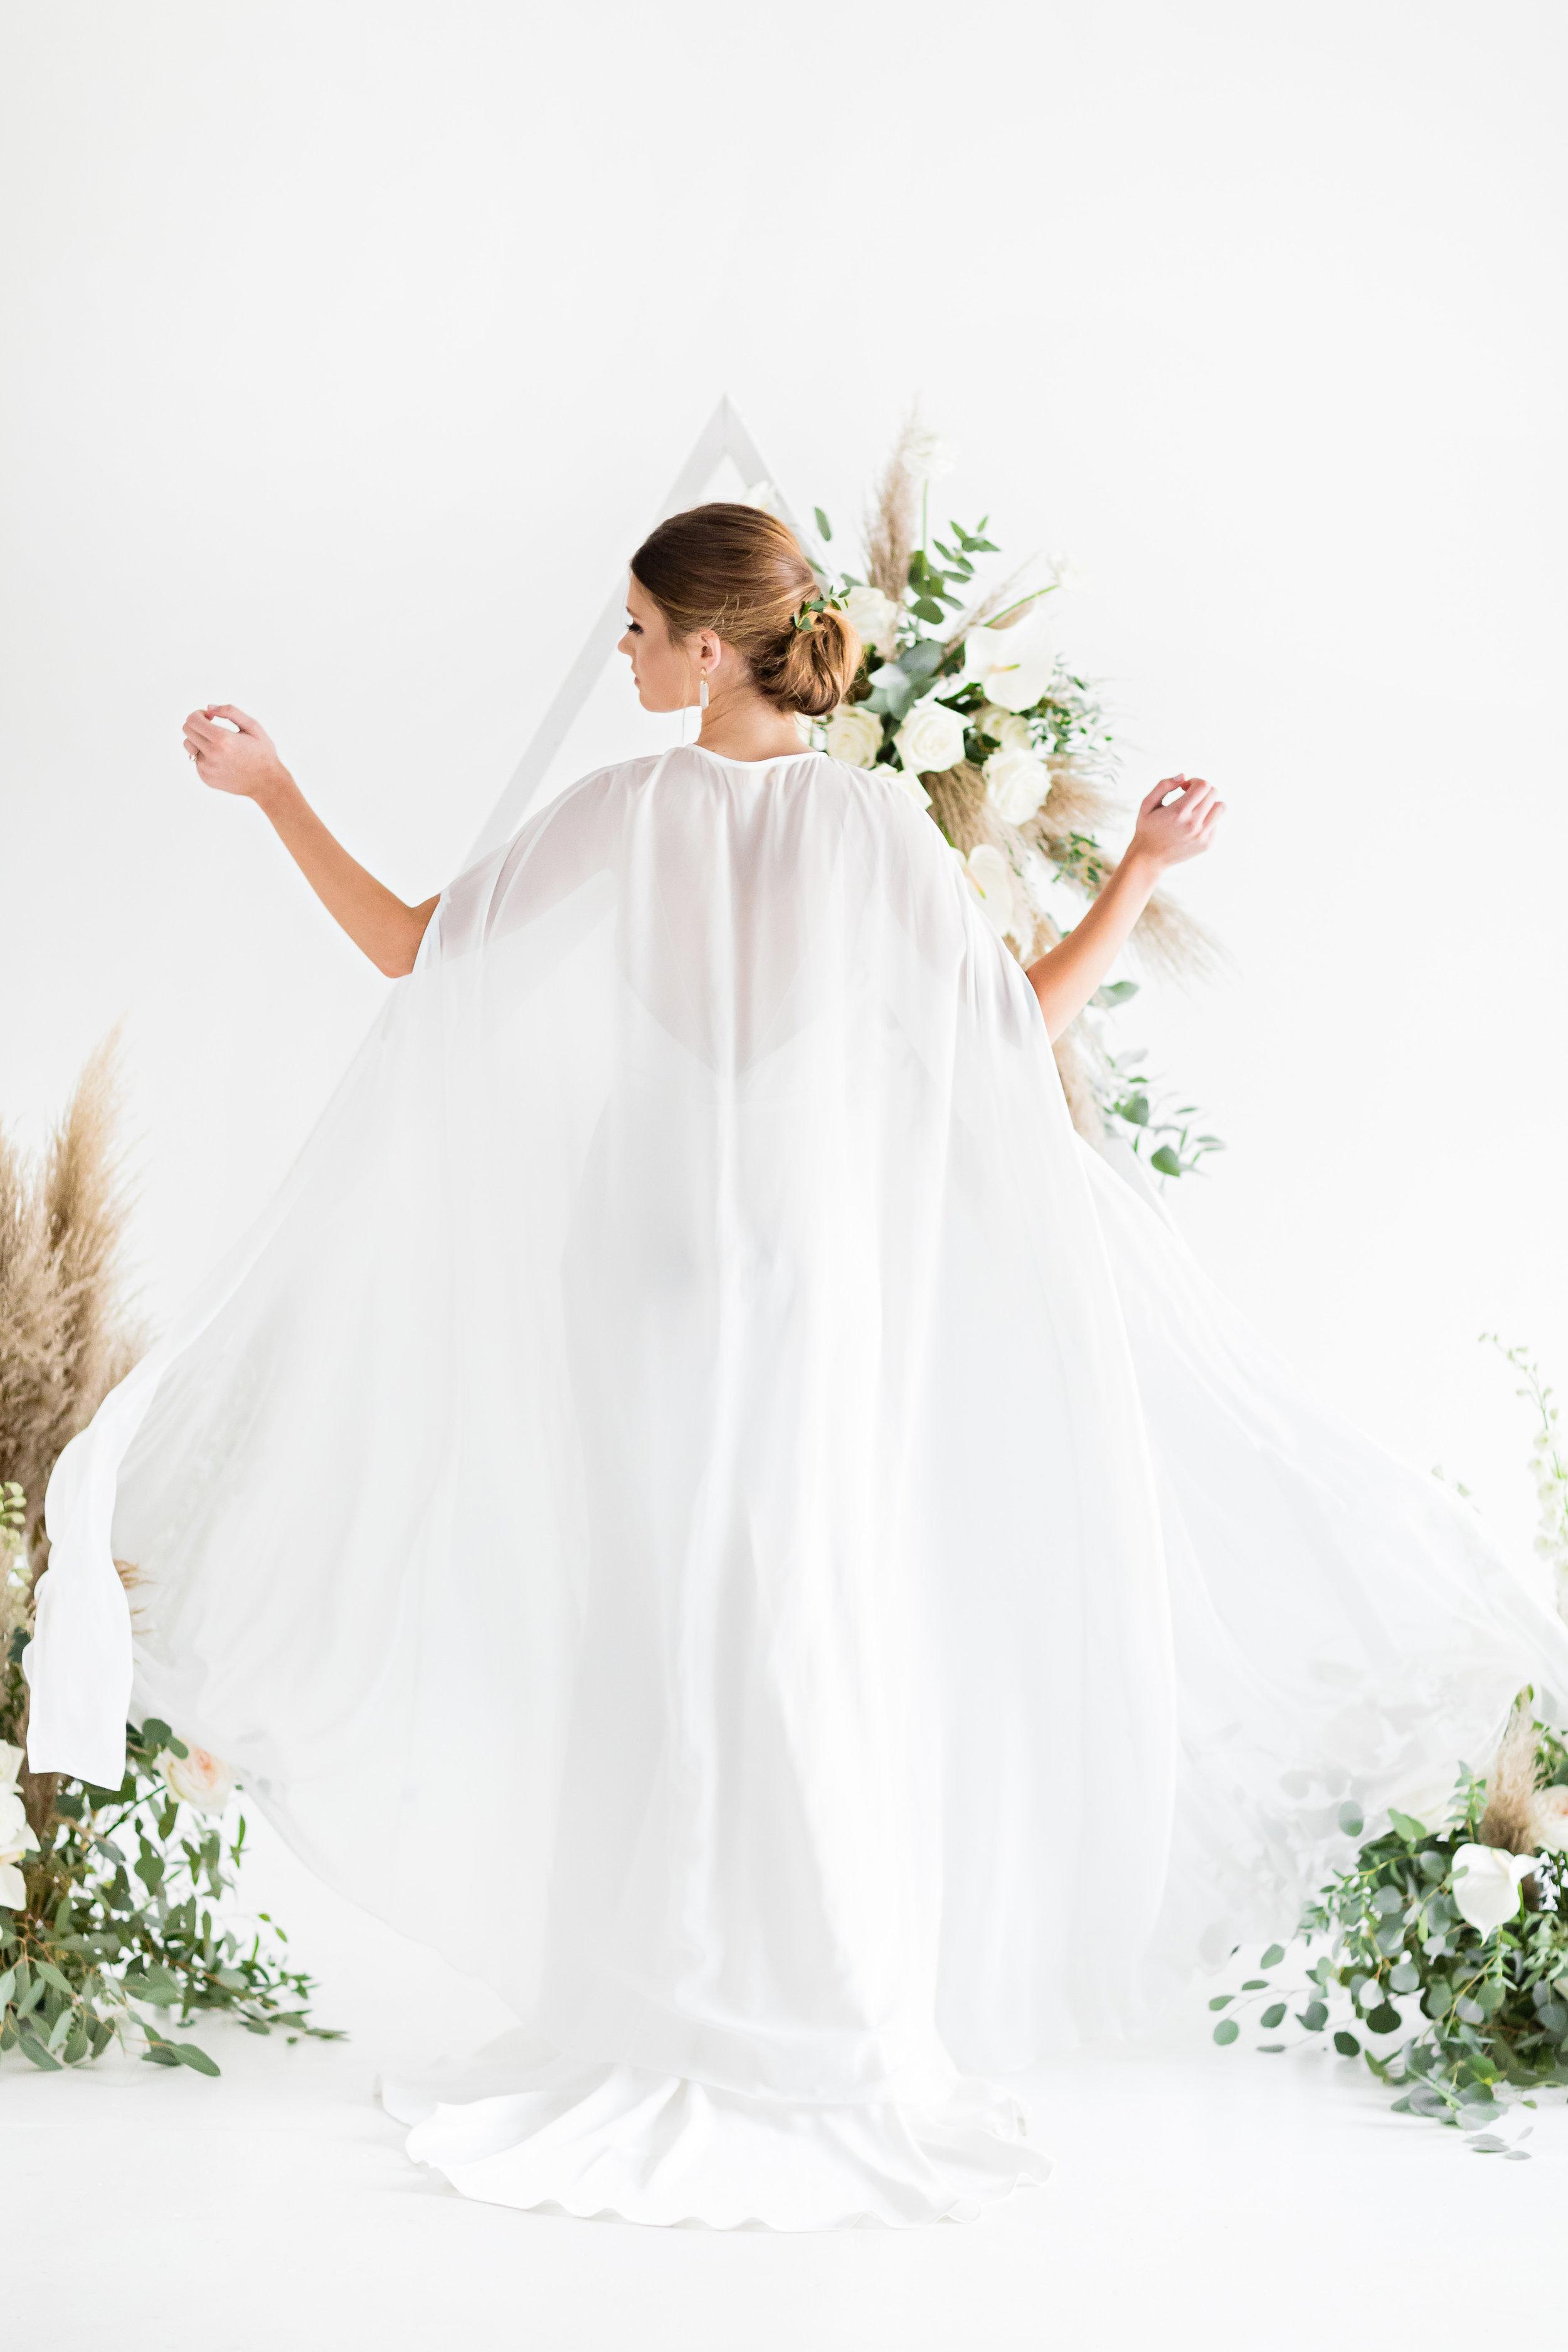 bridal-editorial-photographer-toronto-eryn-shea-photography-15.jpg